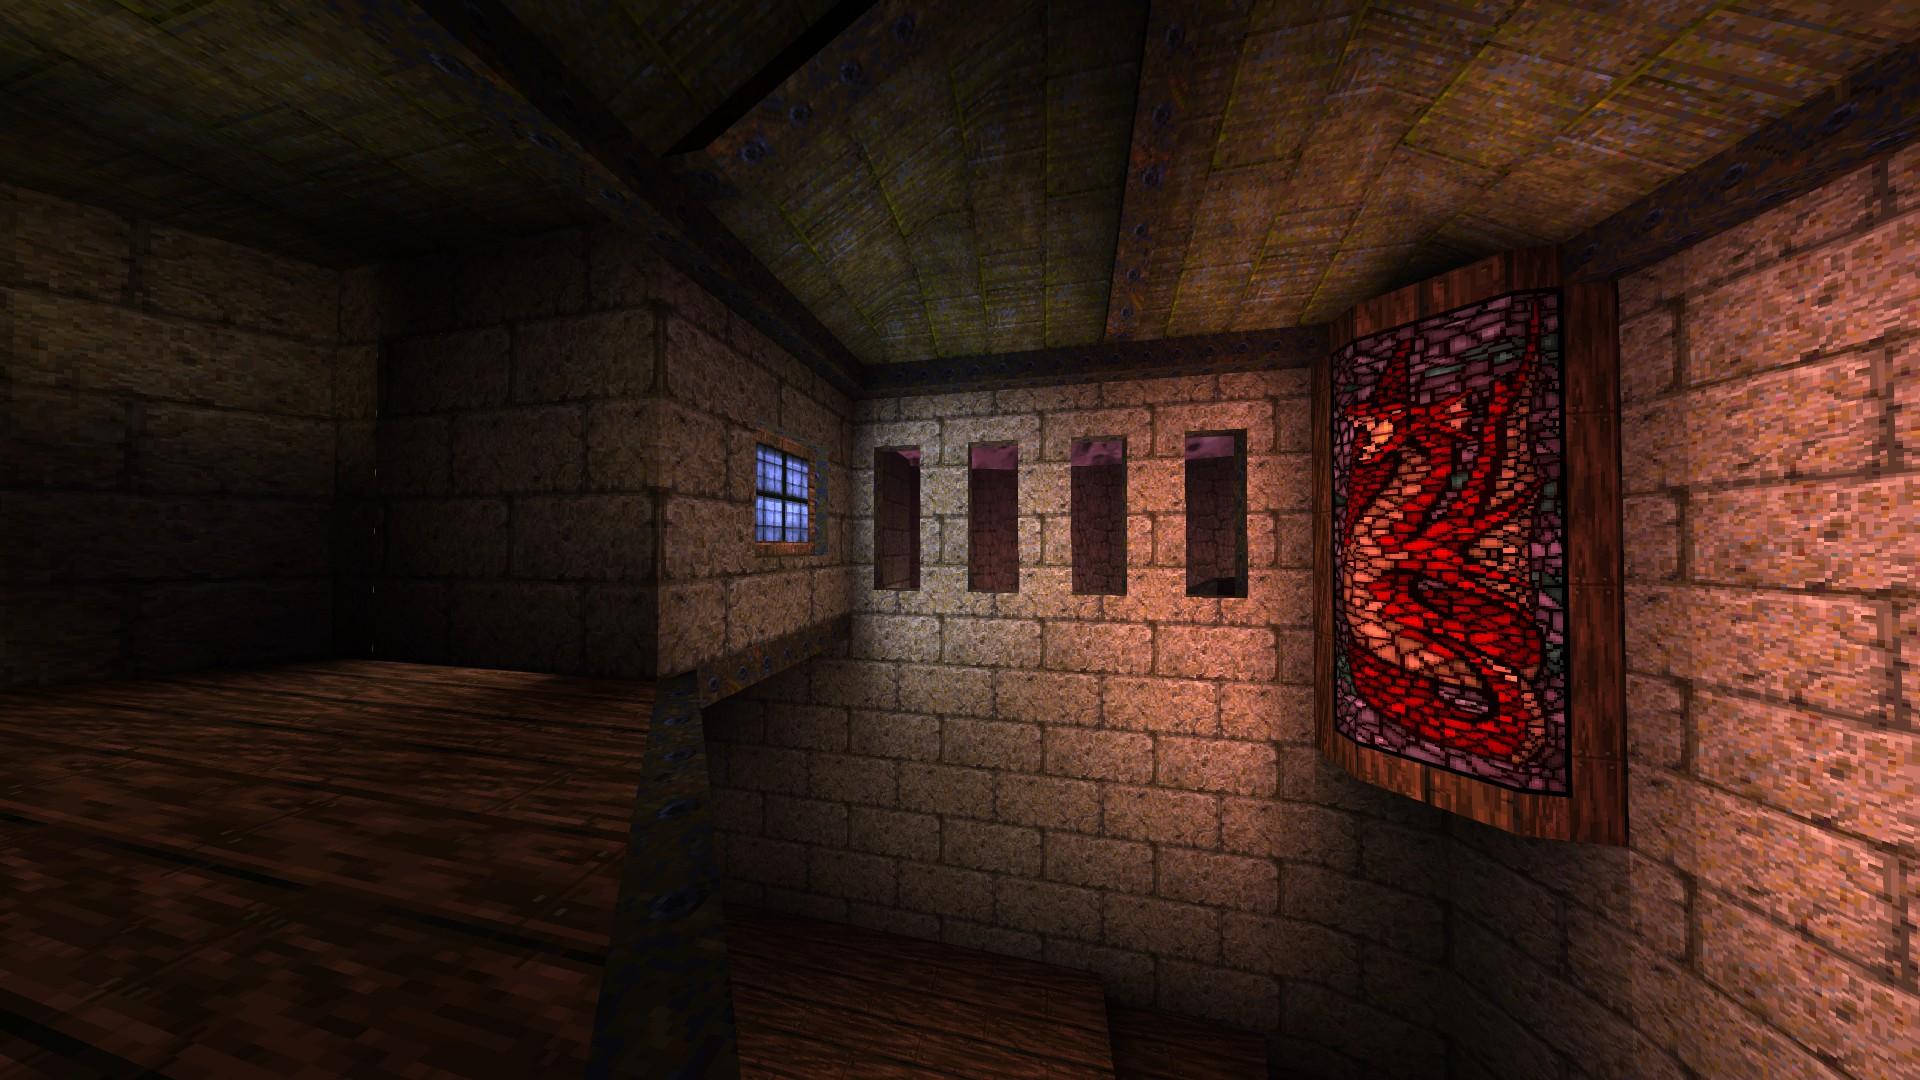 Quake - Locations of All Secrets in Game Tips - E2: Dominion of Darkness - Part I - DDBF874